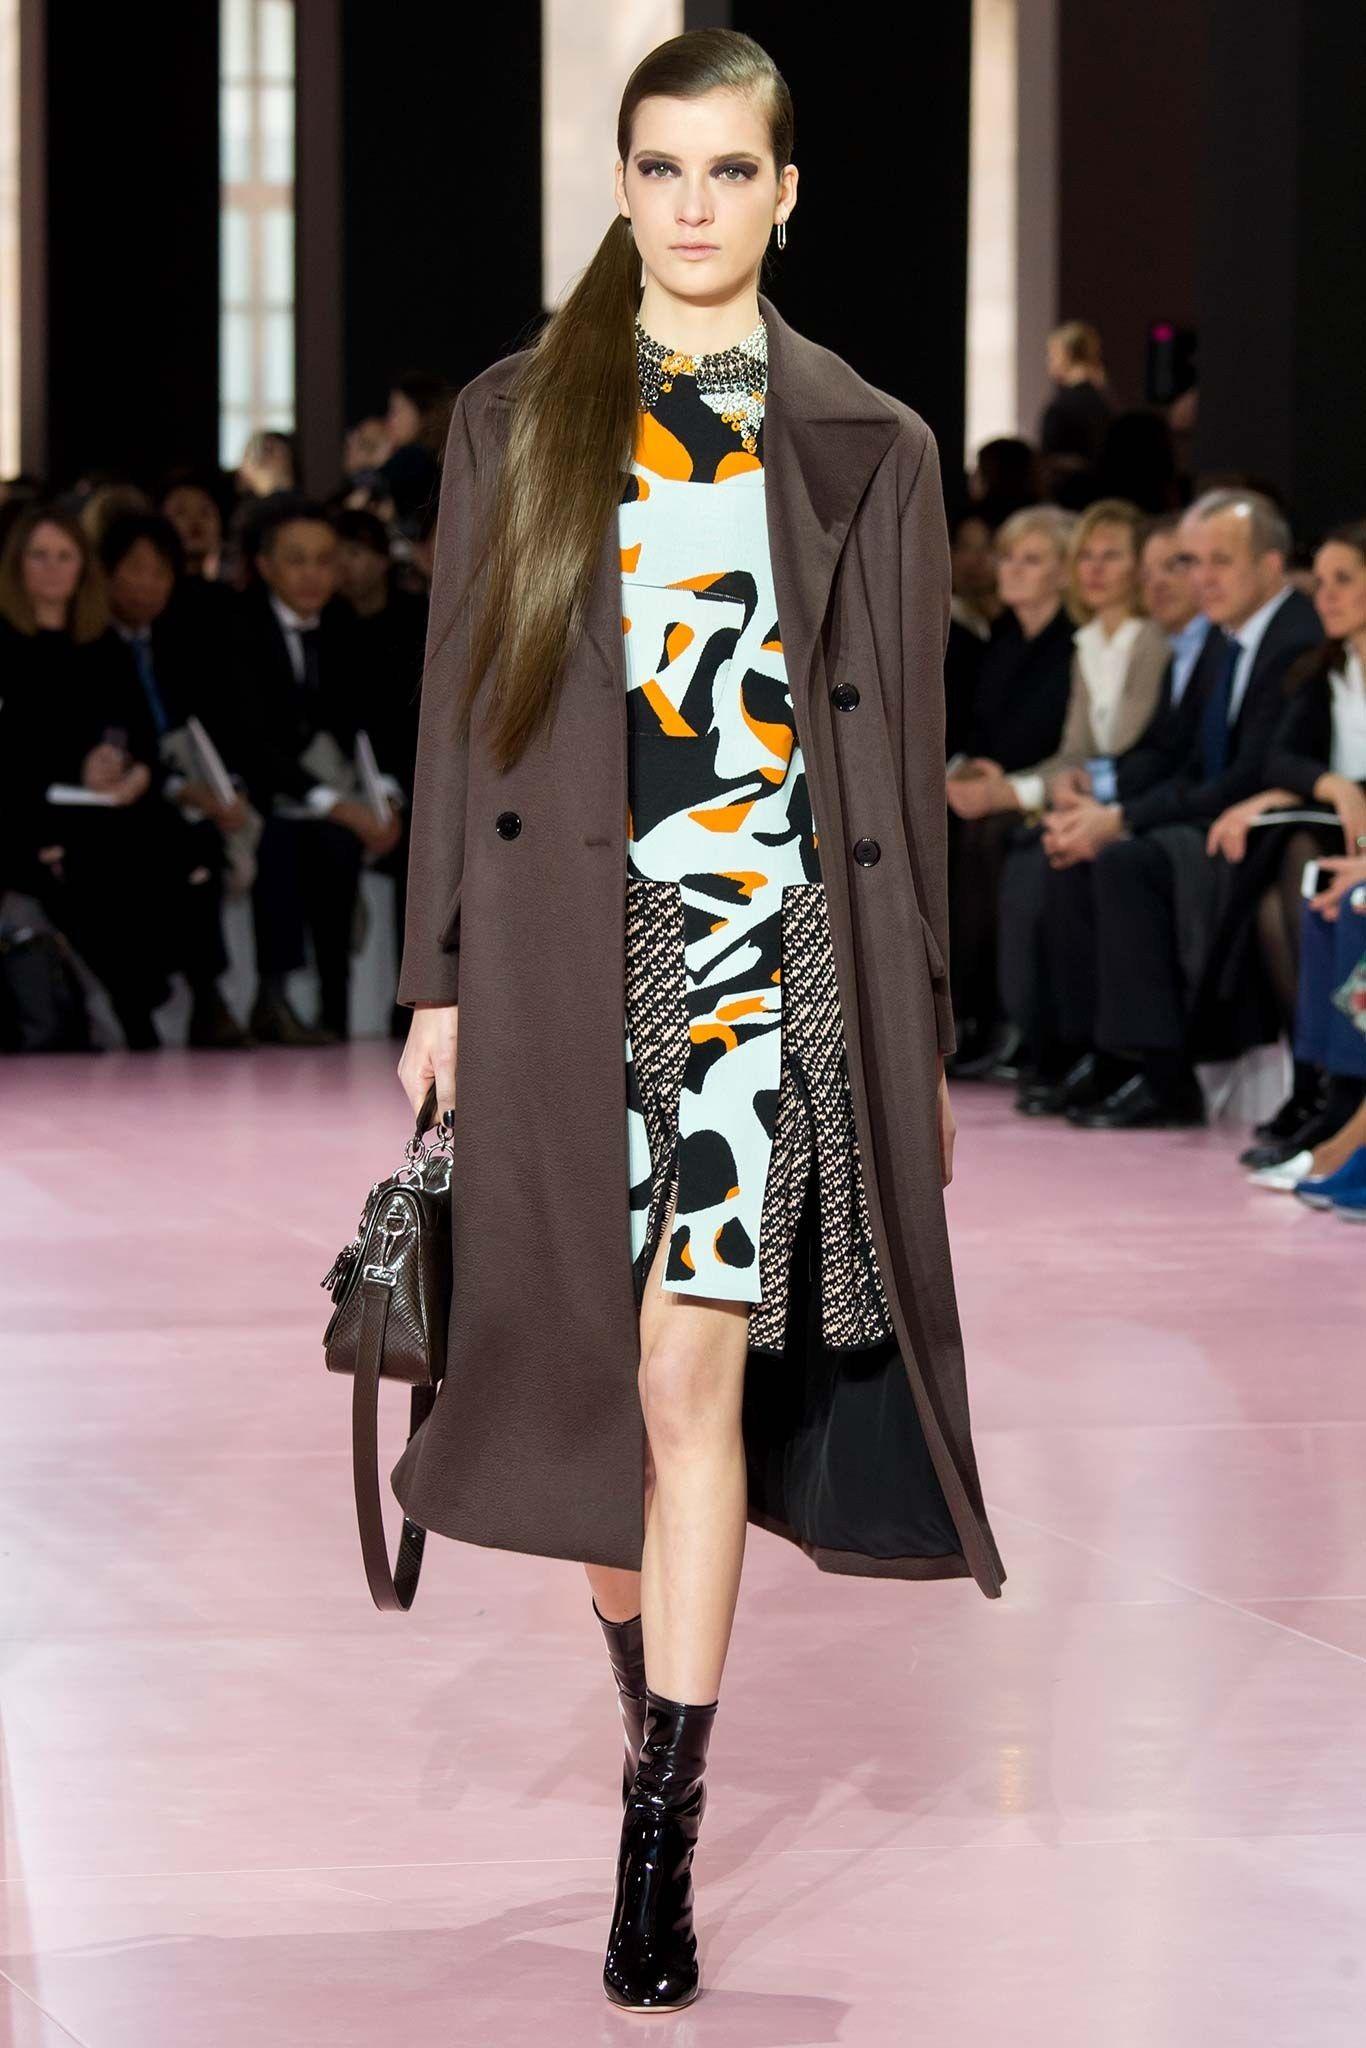 Christian Dior Fall 2015 Ready-to-Wear Fashion Show - Lis van Velthoven (Supreme)